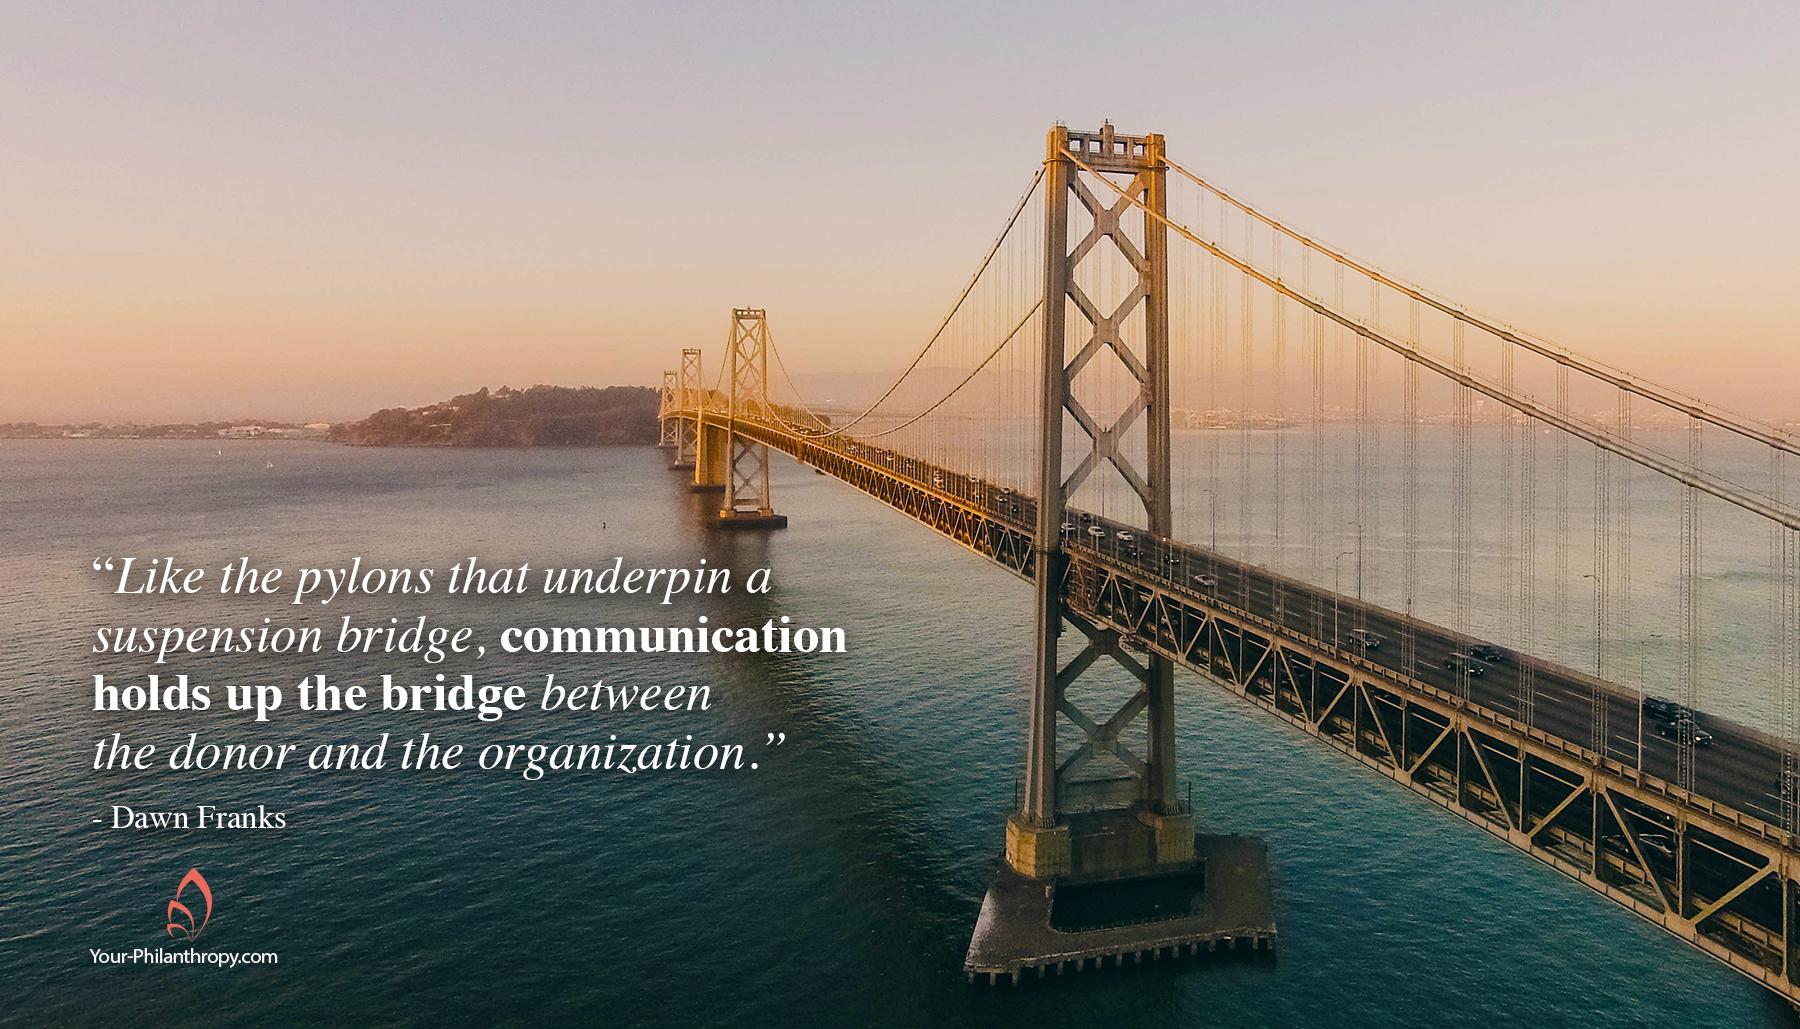 donor communucation